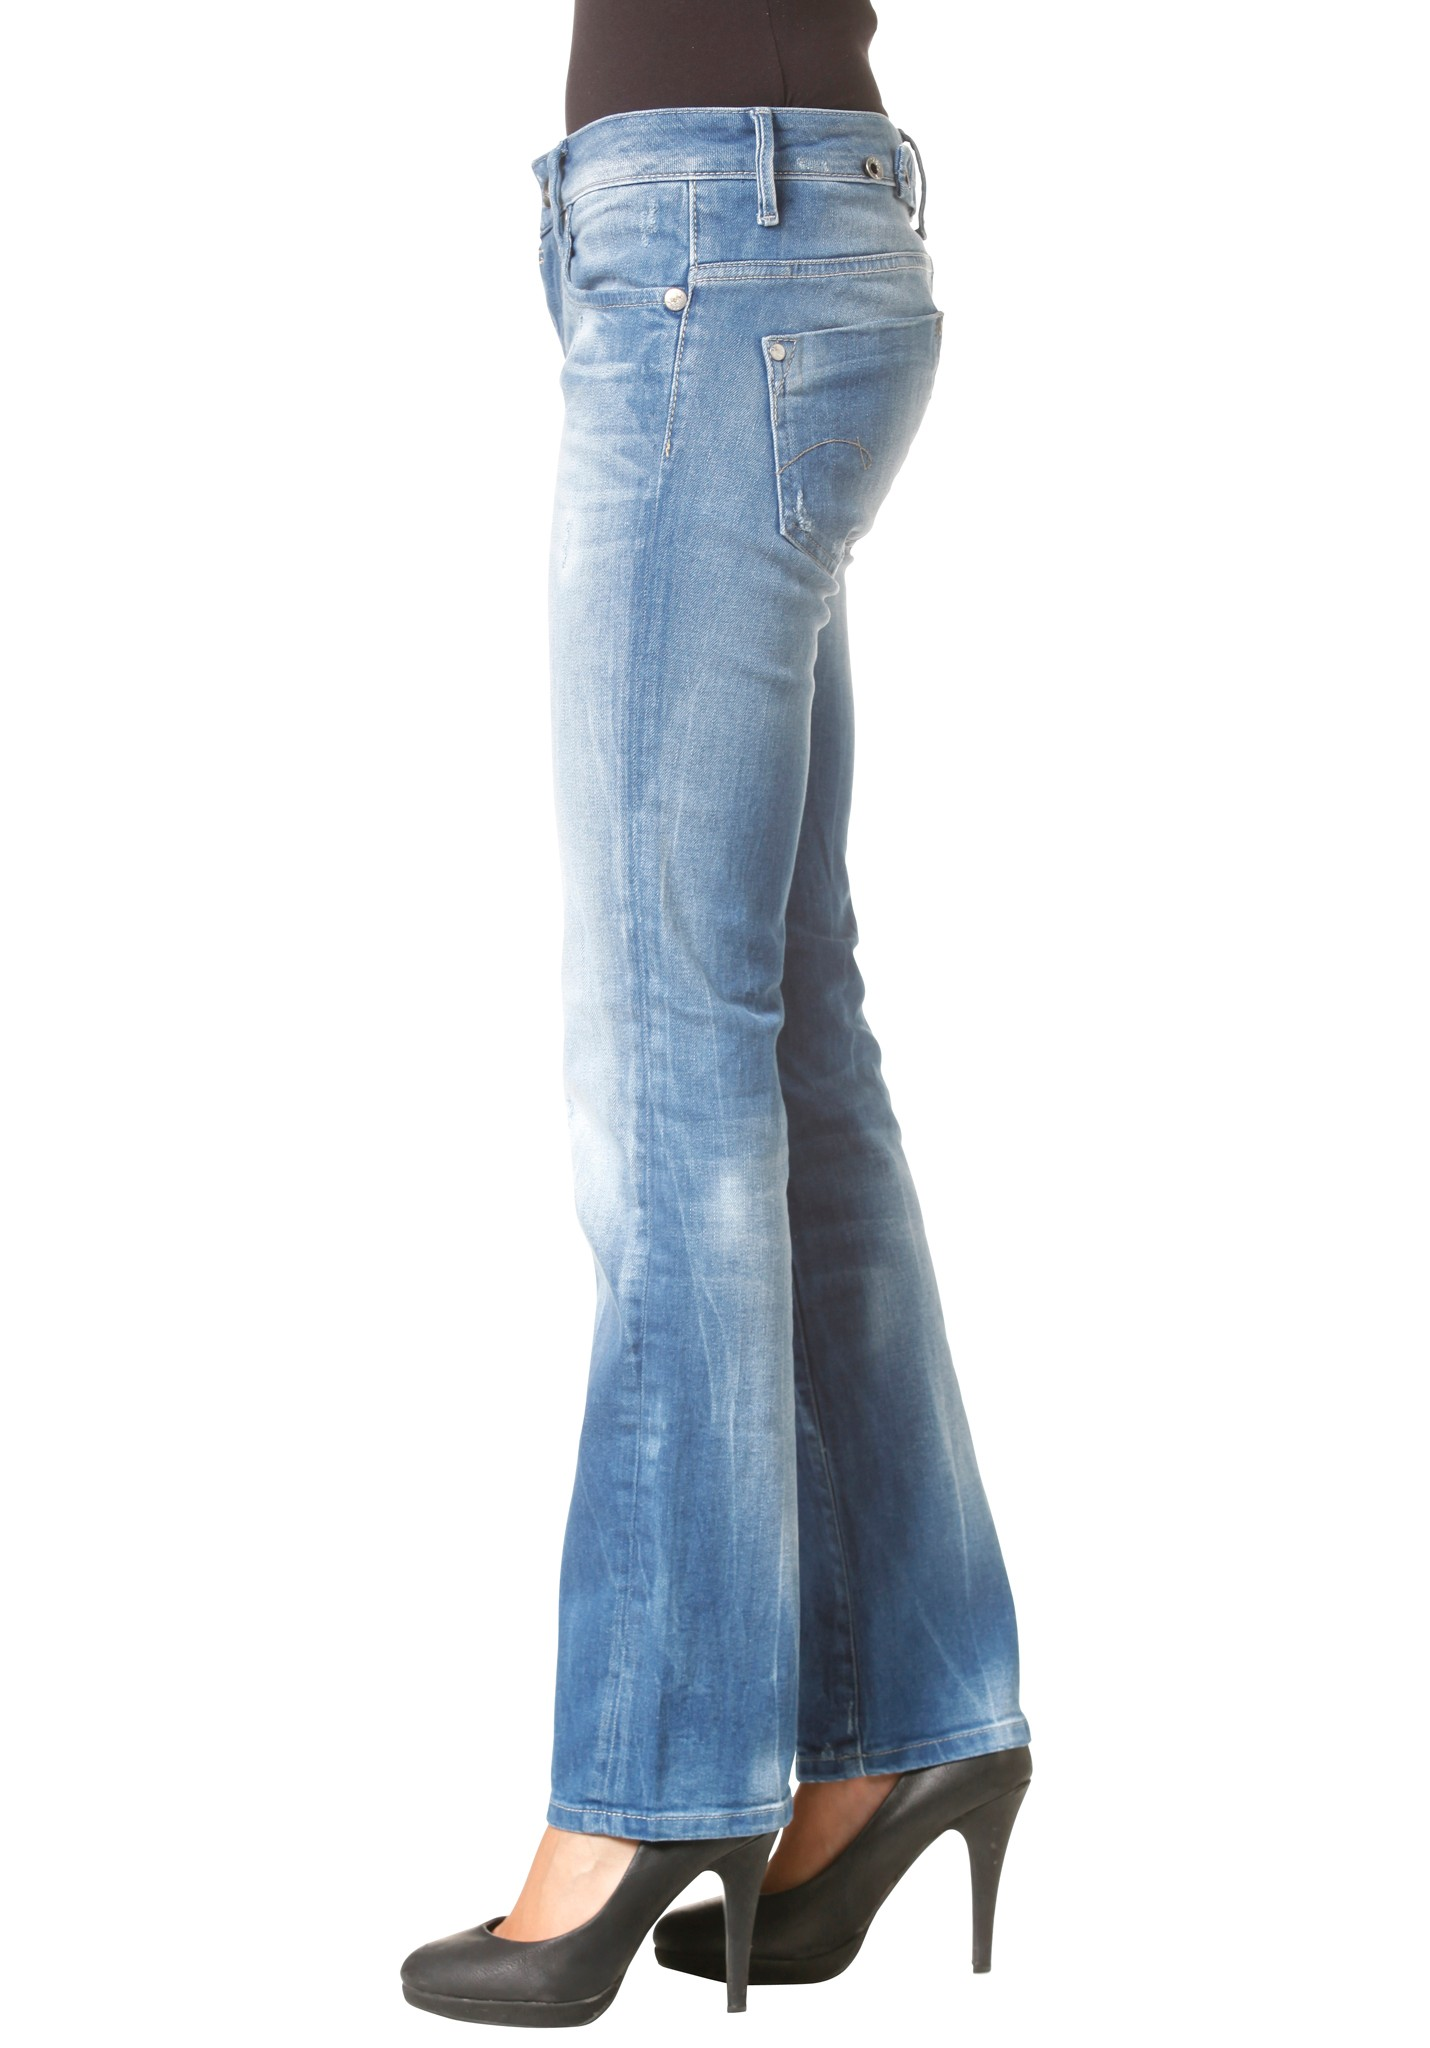 neu g star midge straight comfort edit denim damen jeans. Black Bedroom Furniture Sets. Home Design Ideas